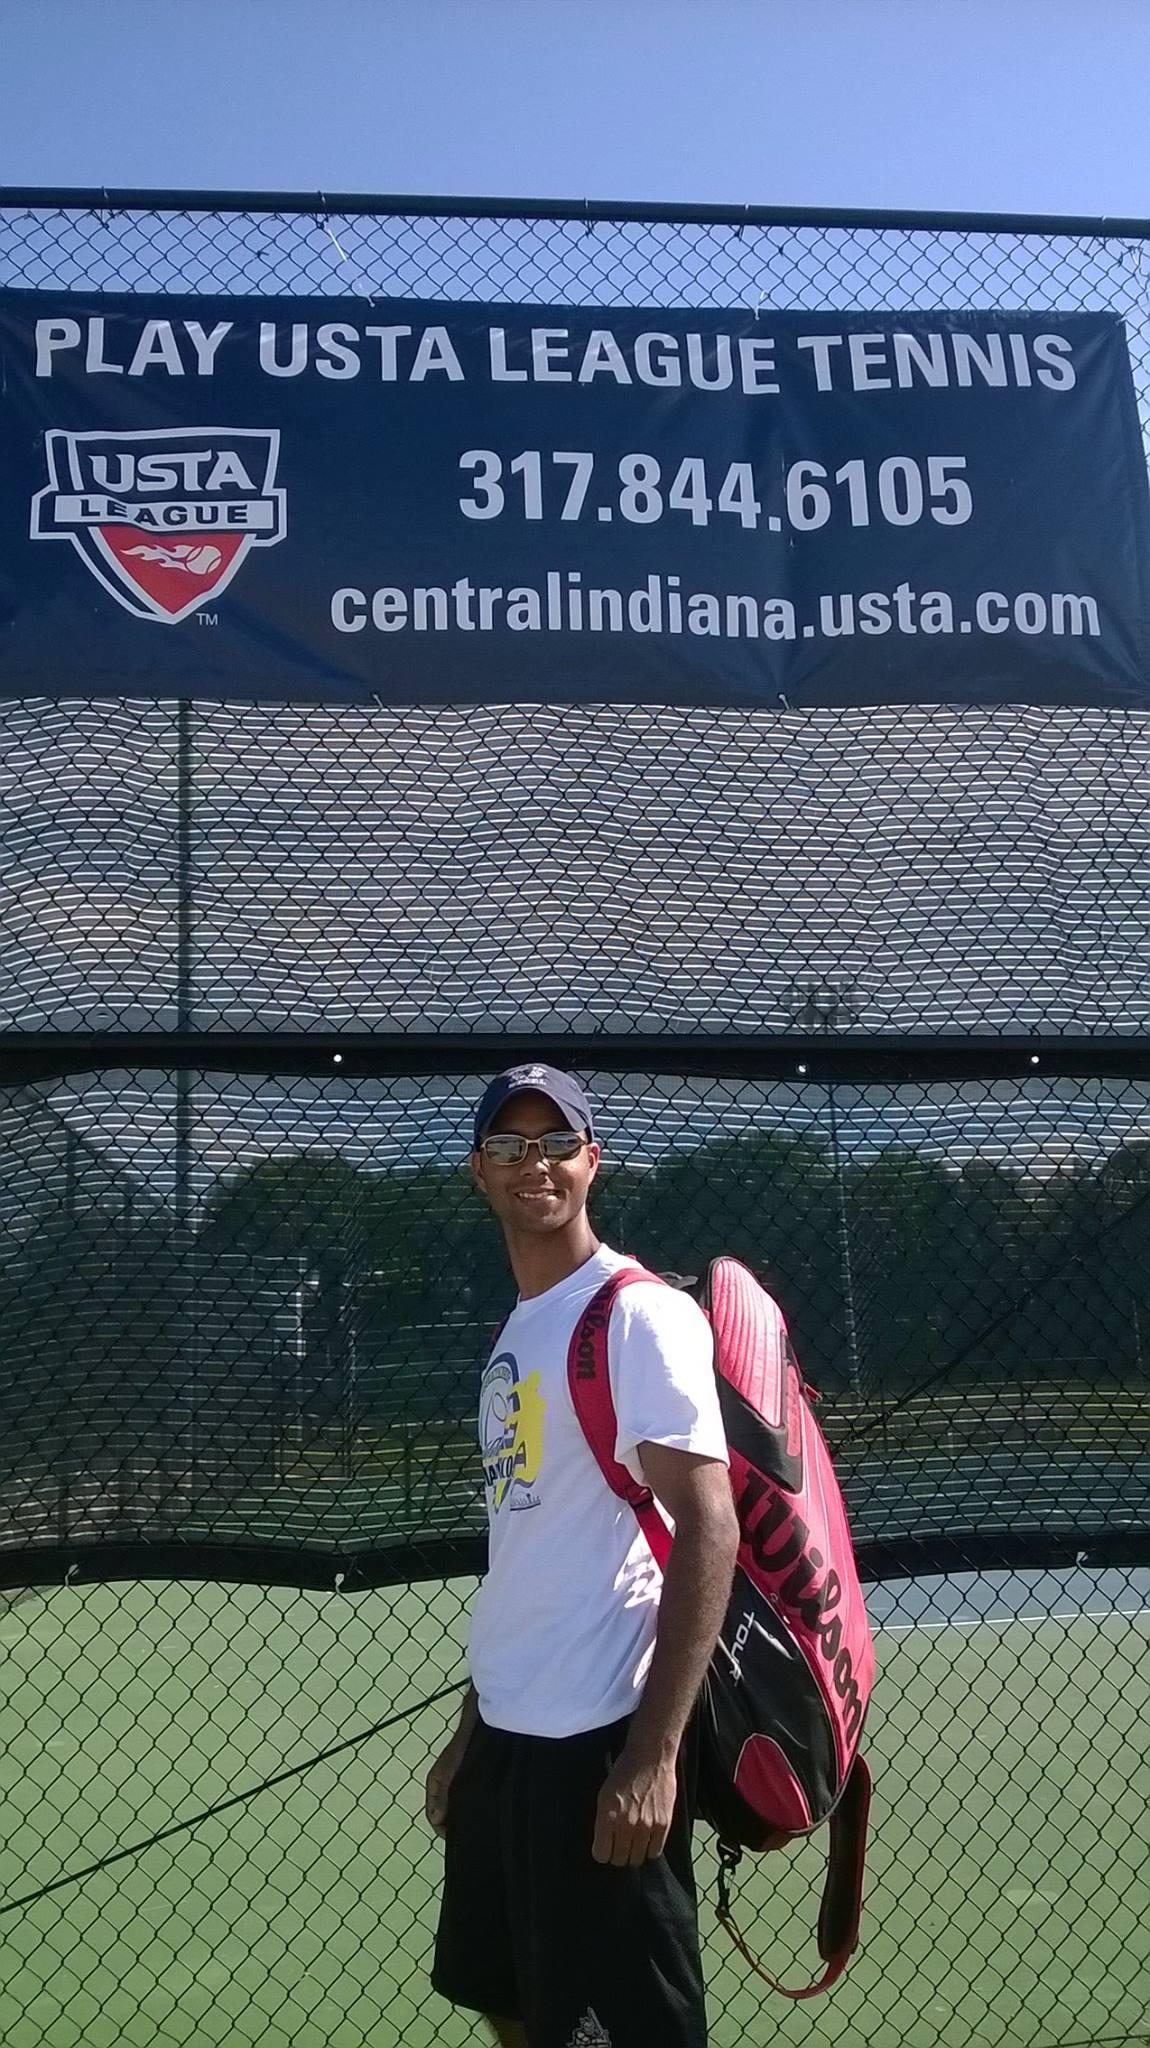 Tennis cleveland